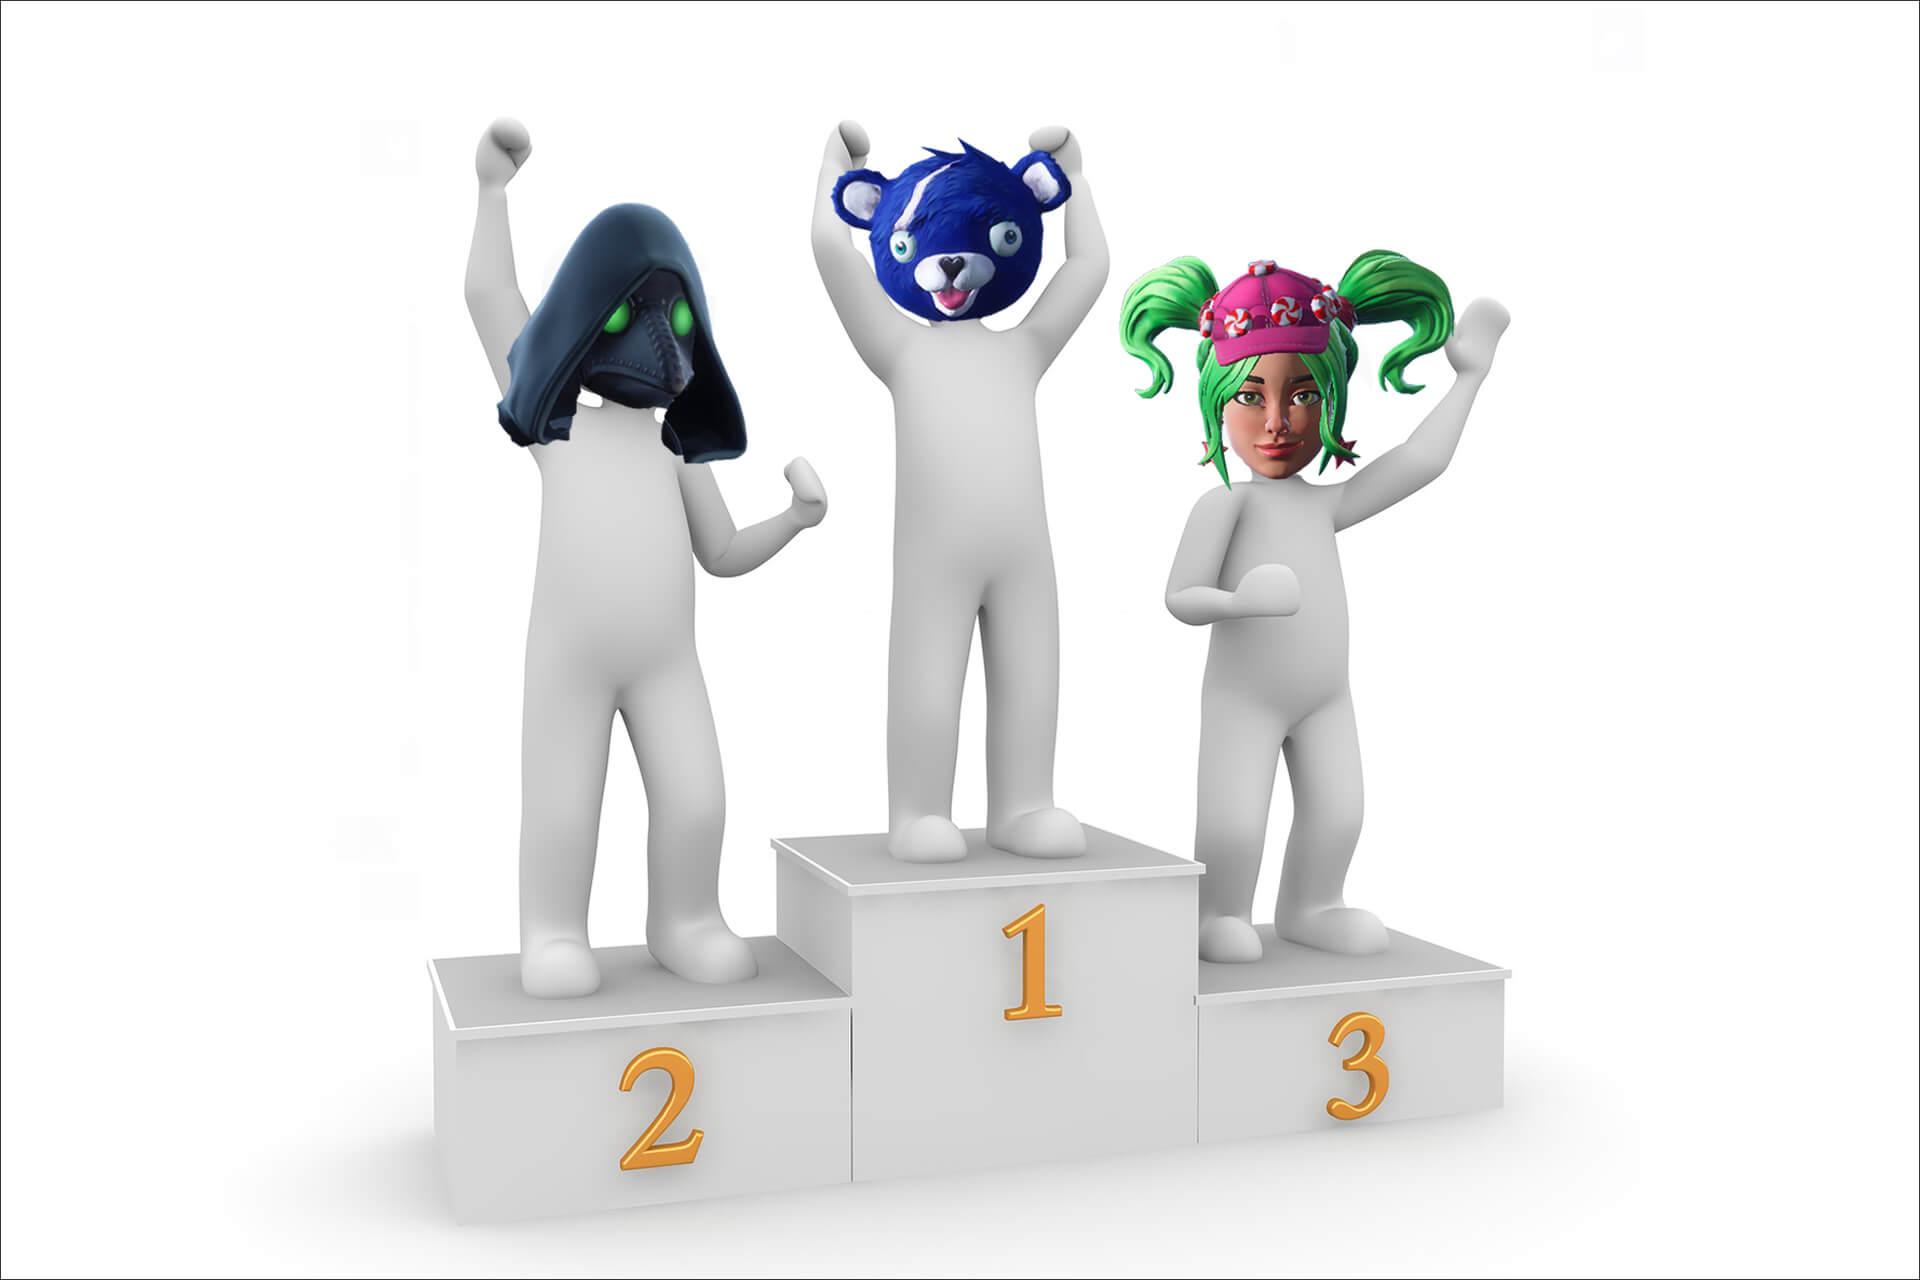 costume-ranking-f1